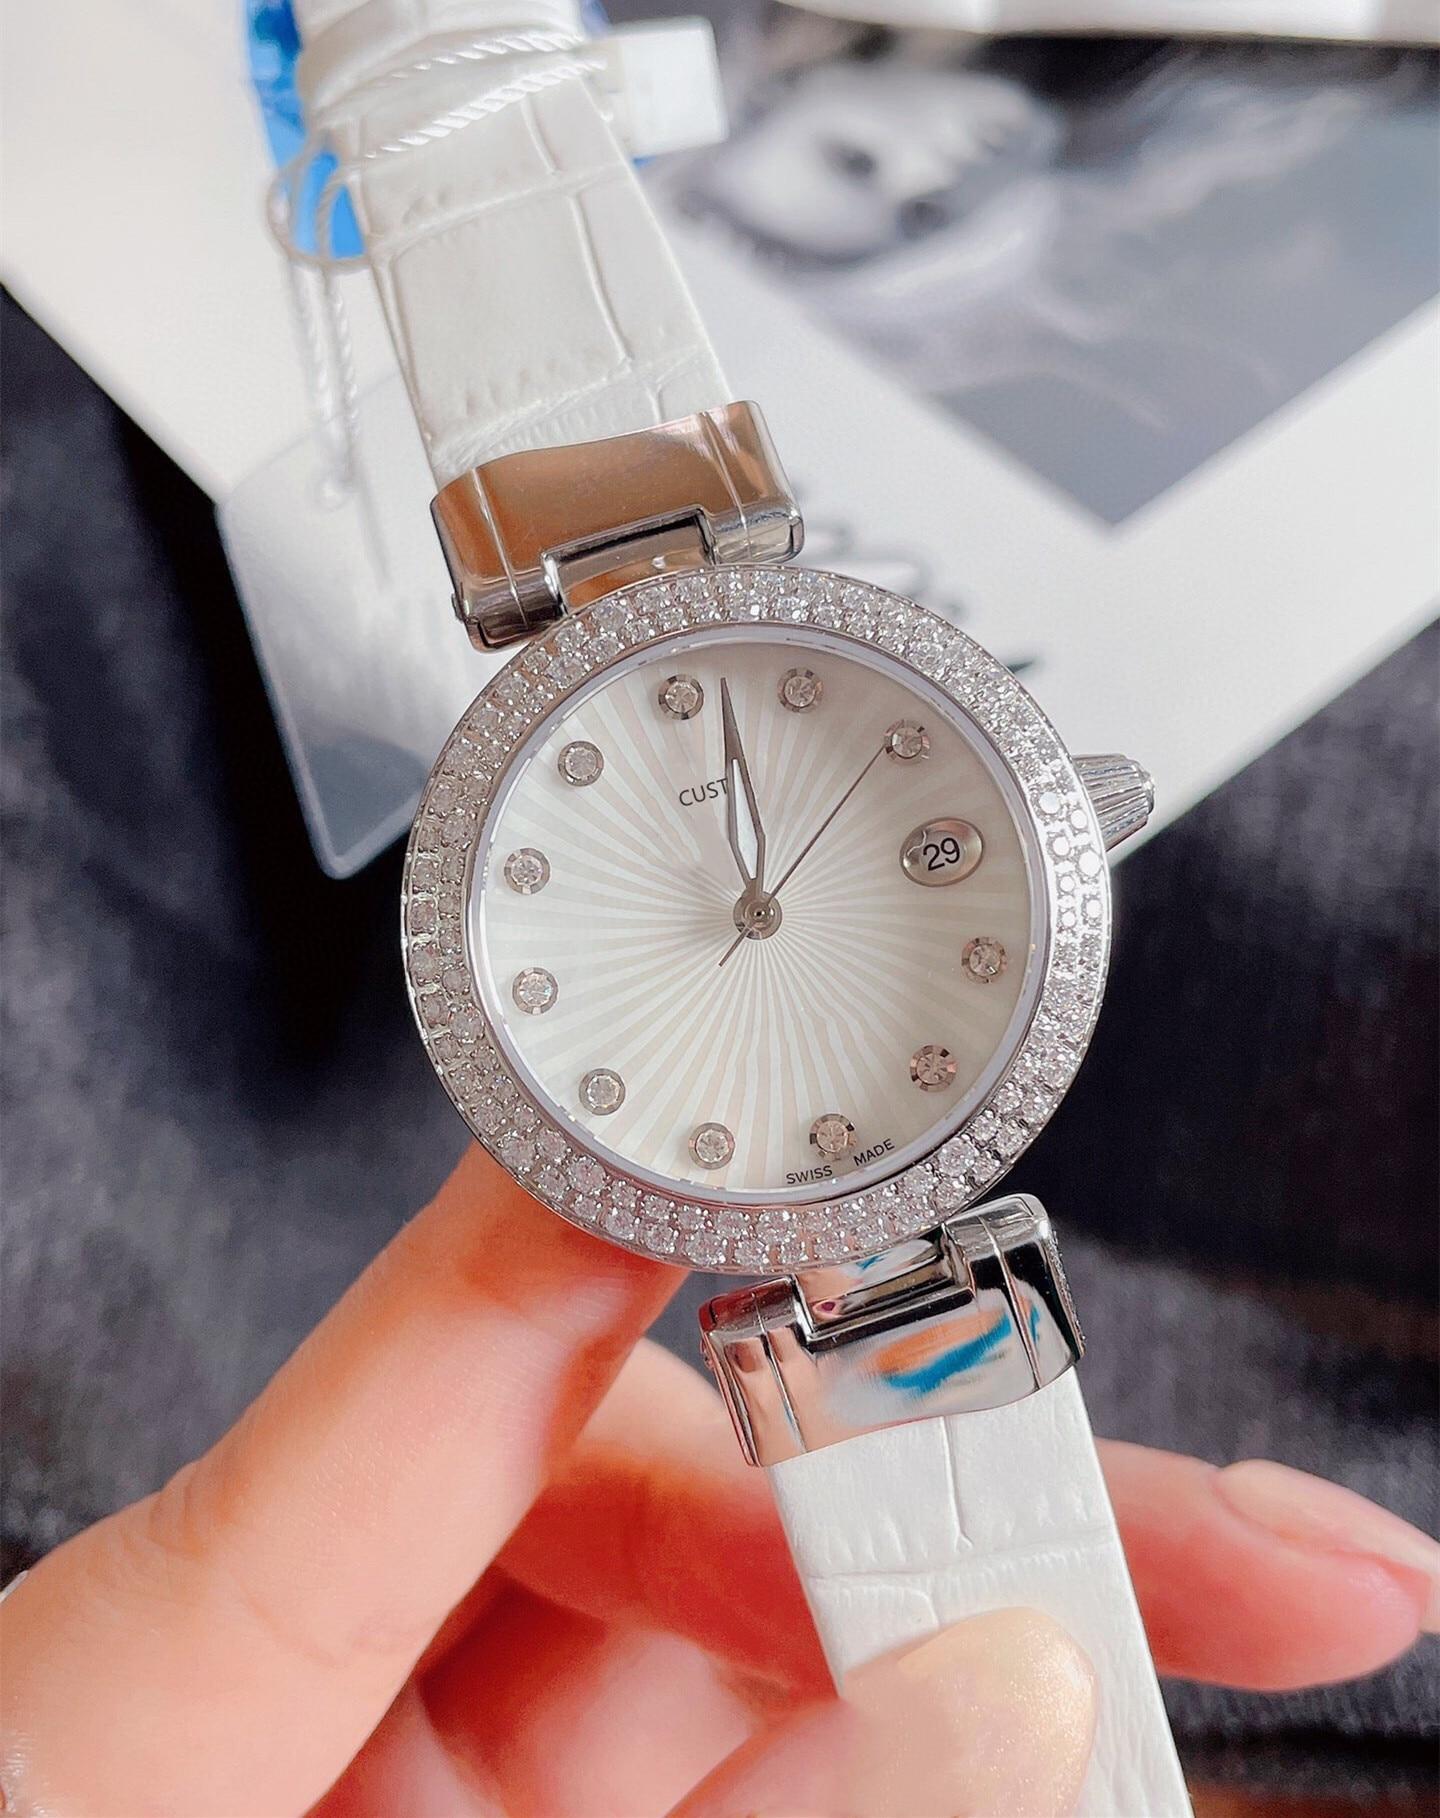 Fashion Geometric Round Diamond Strap watches Women Silver White Stainless Steel Quartz watch Ladies Mother of pearl Clock 35mm